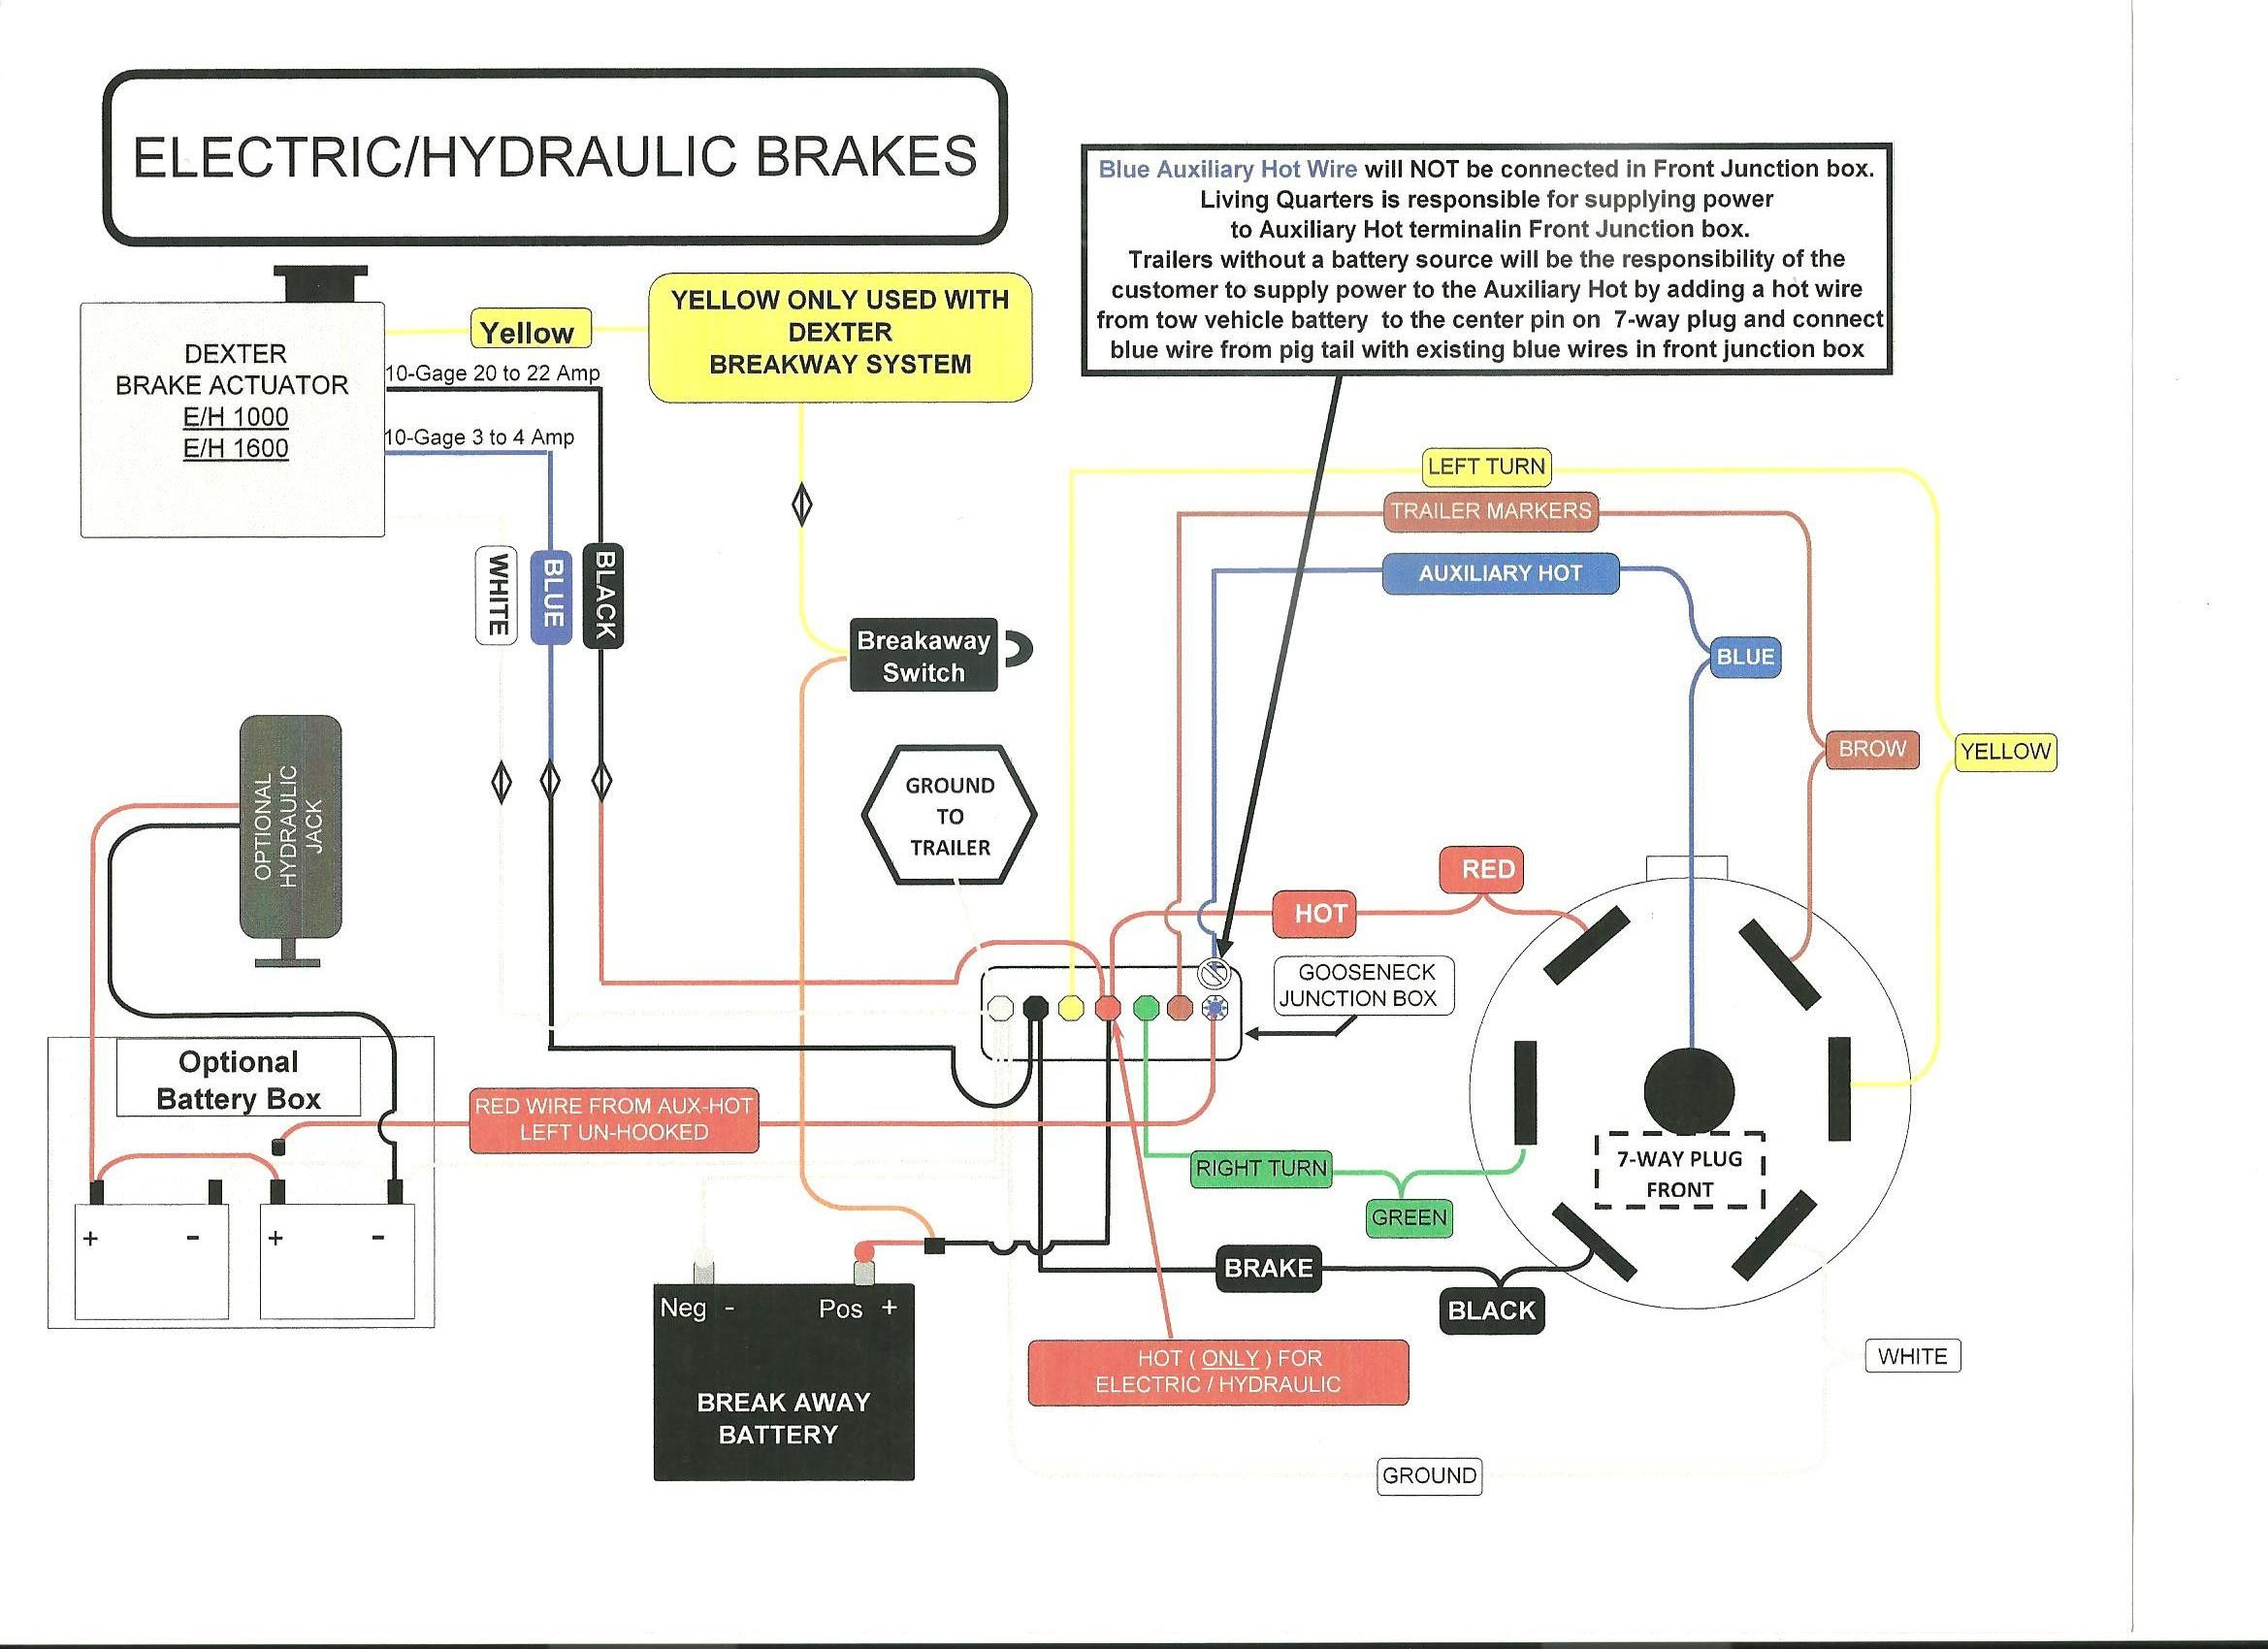 50 Electric Trailer Brake Parts Diagram Un4v in 2020